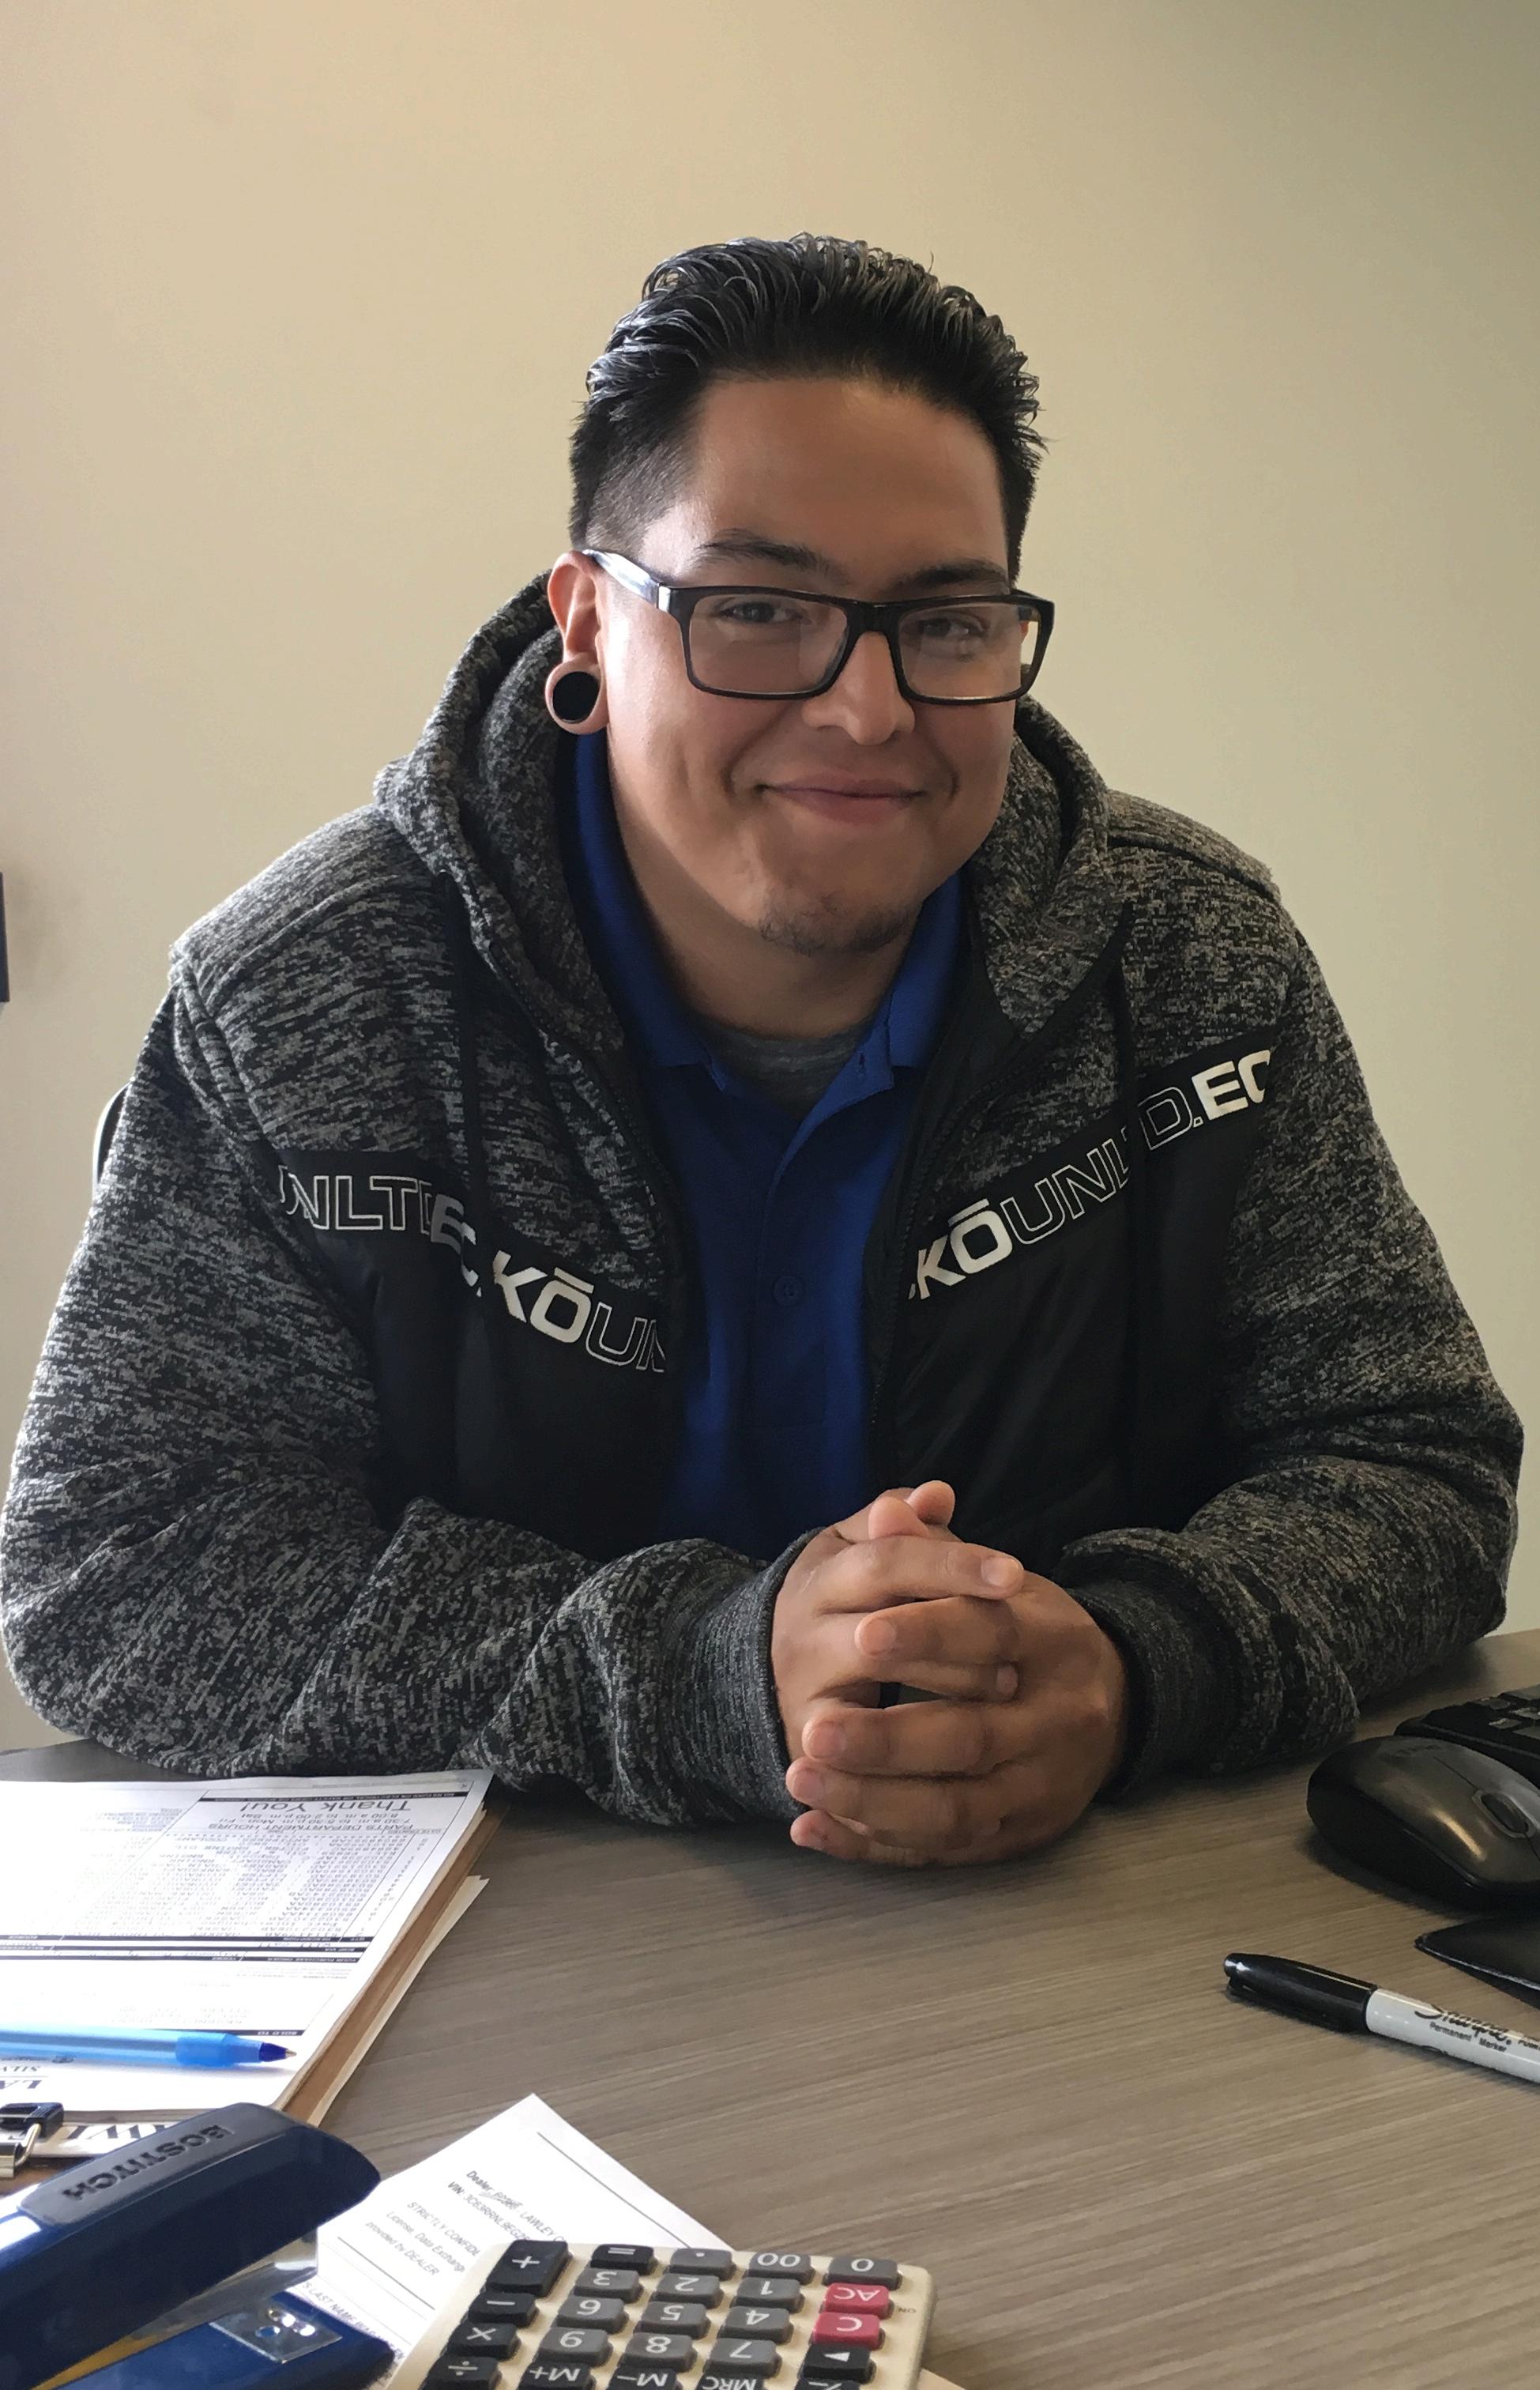 Cody Trujillo - Service Writer